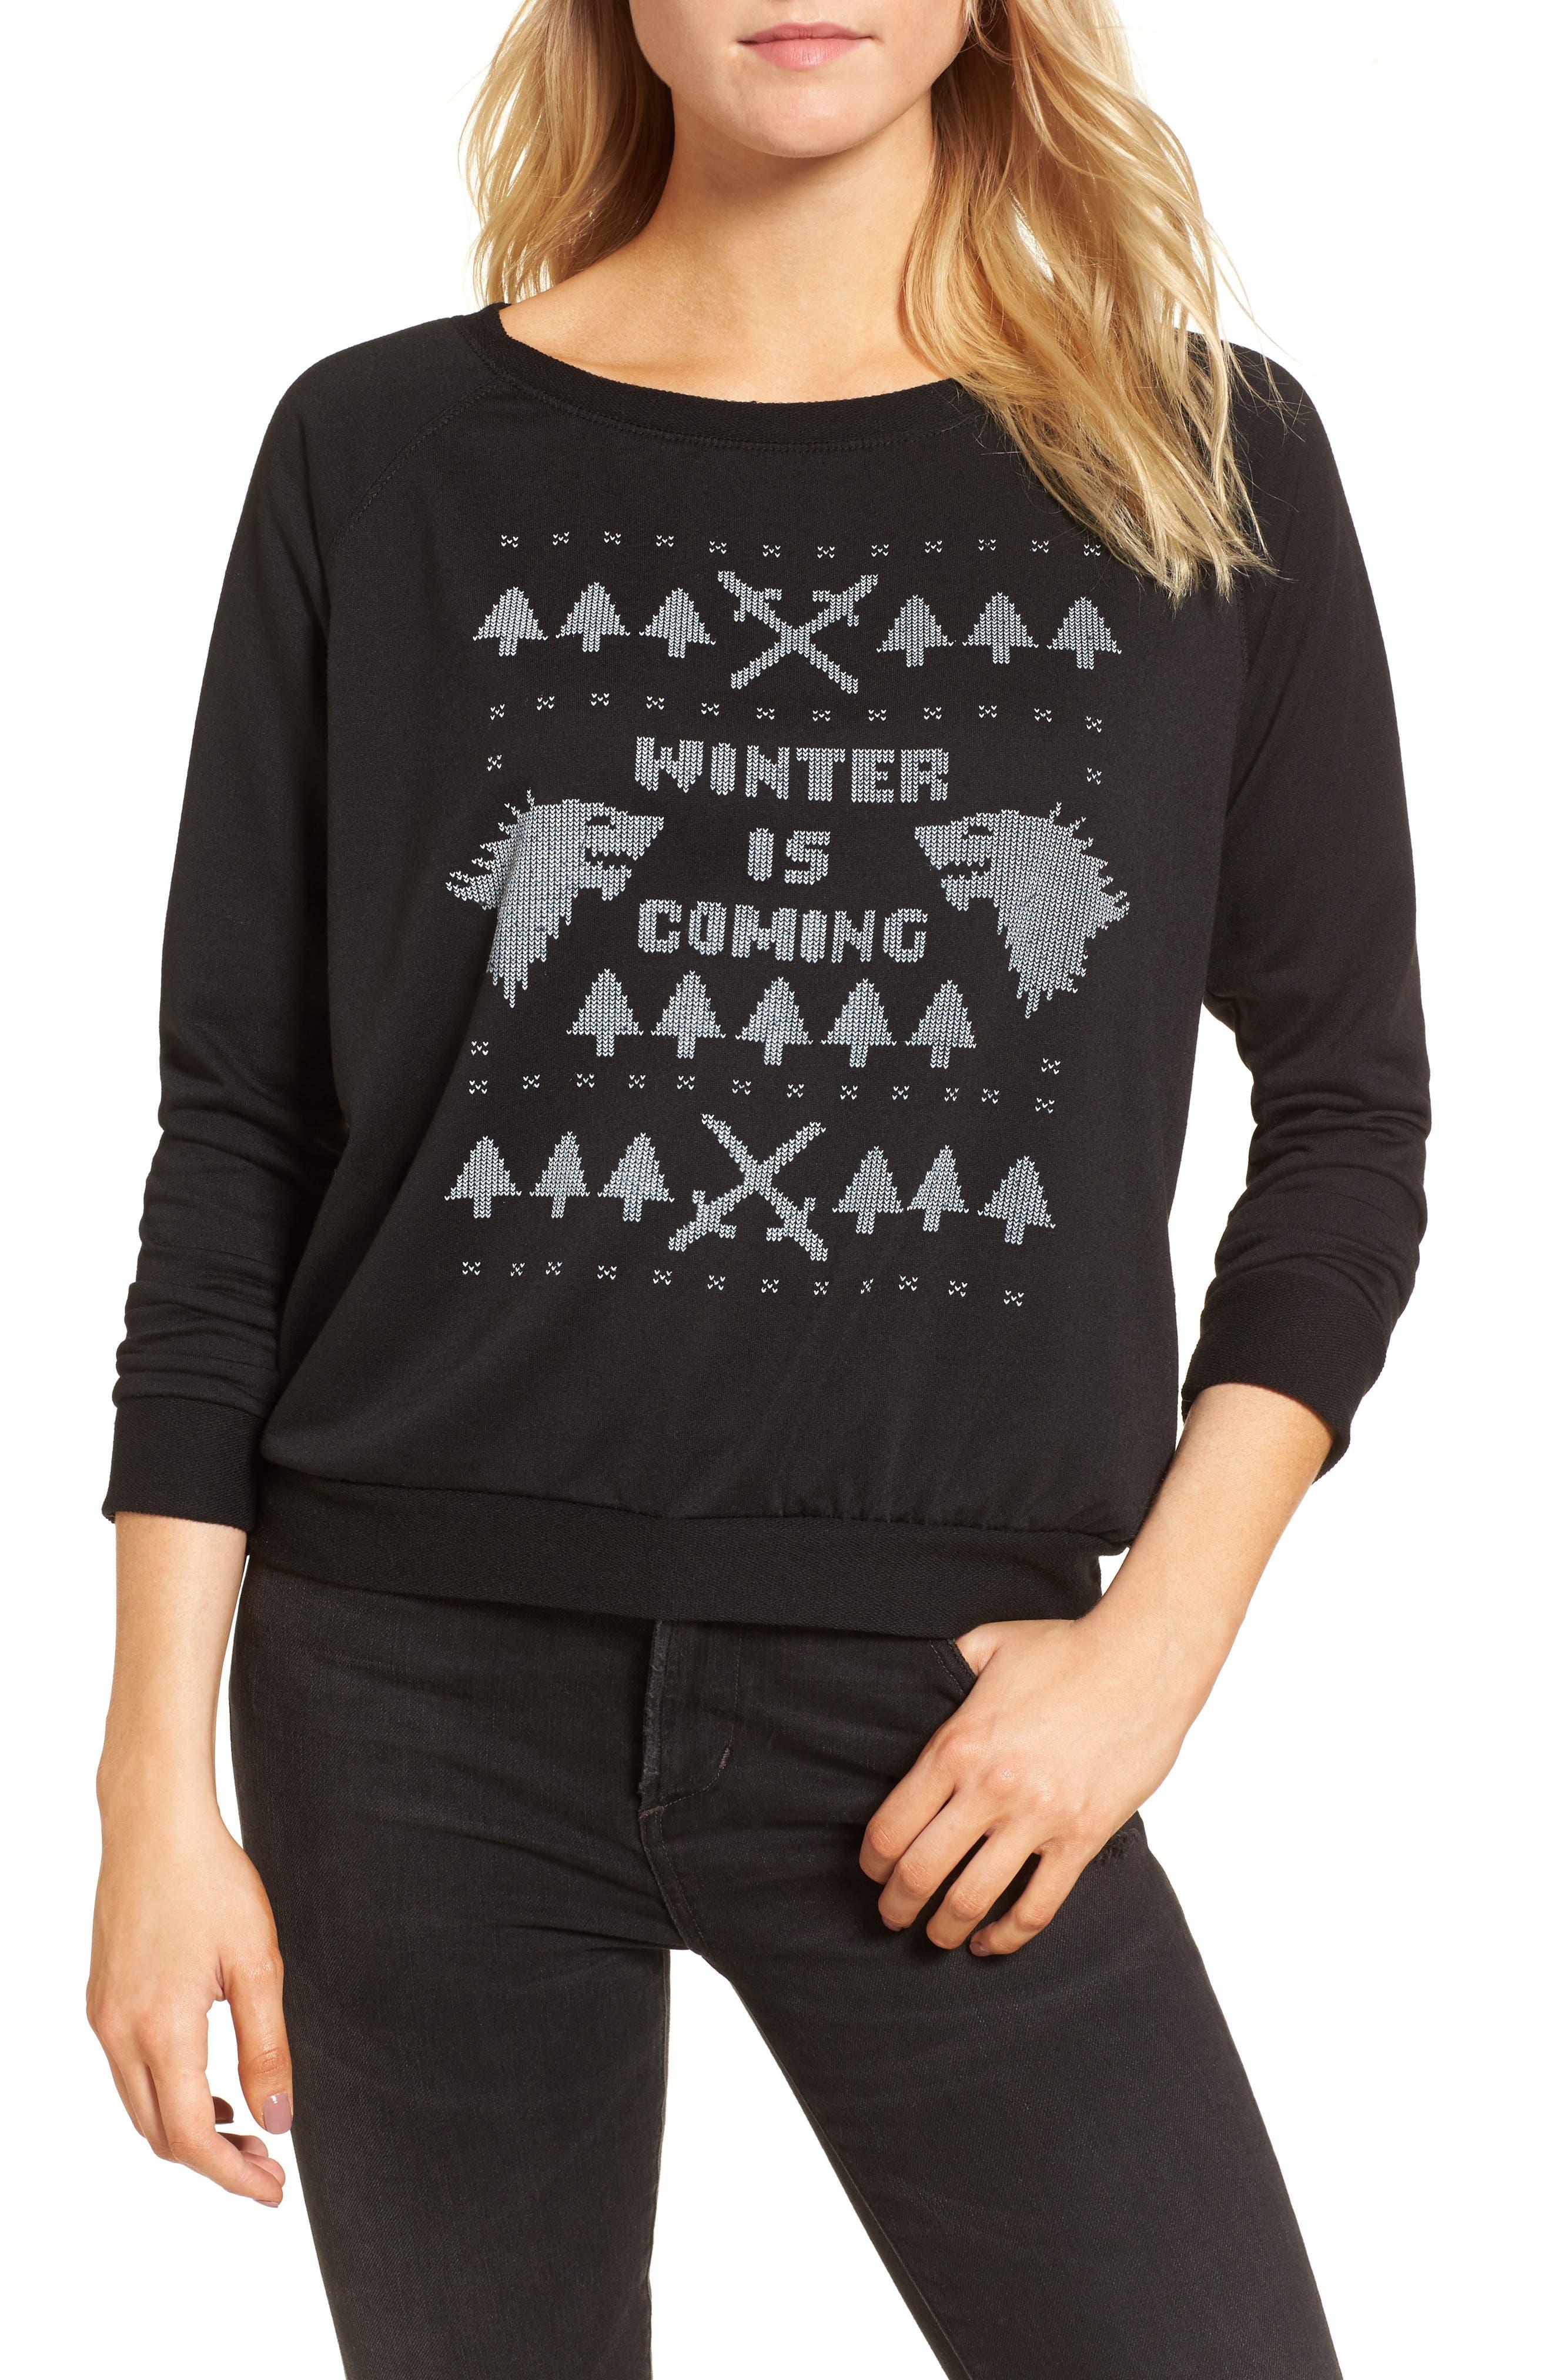 Winter Is Coming Sweatshirt,                             Main thumbnail 1, color,